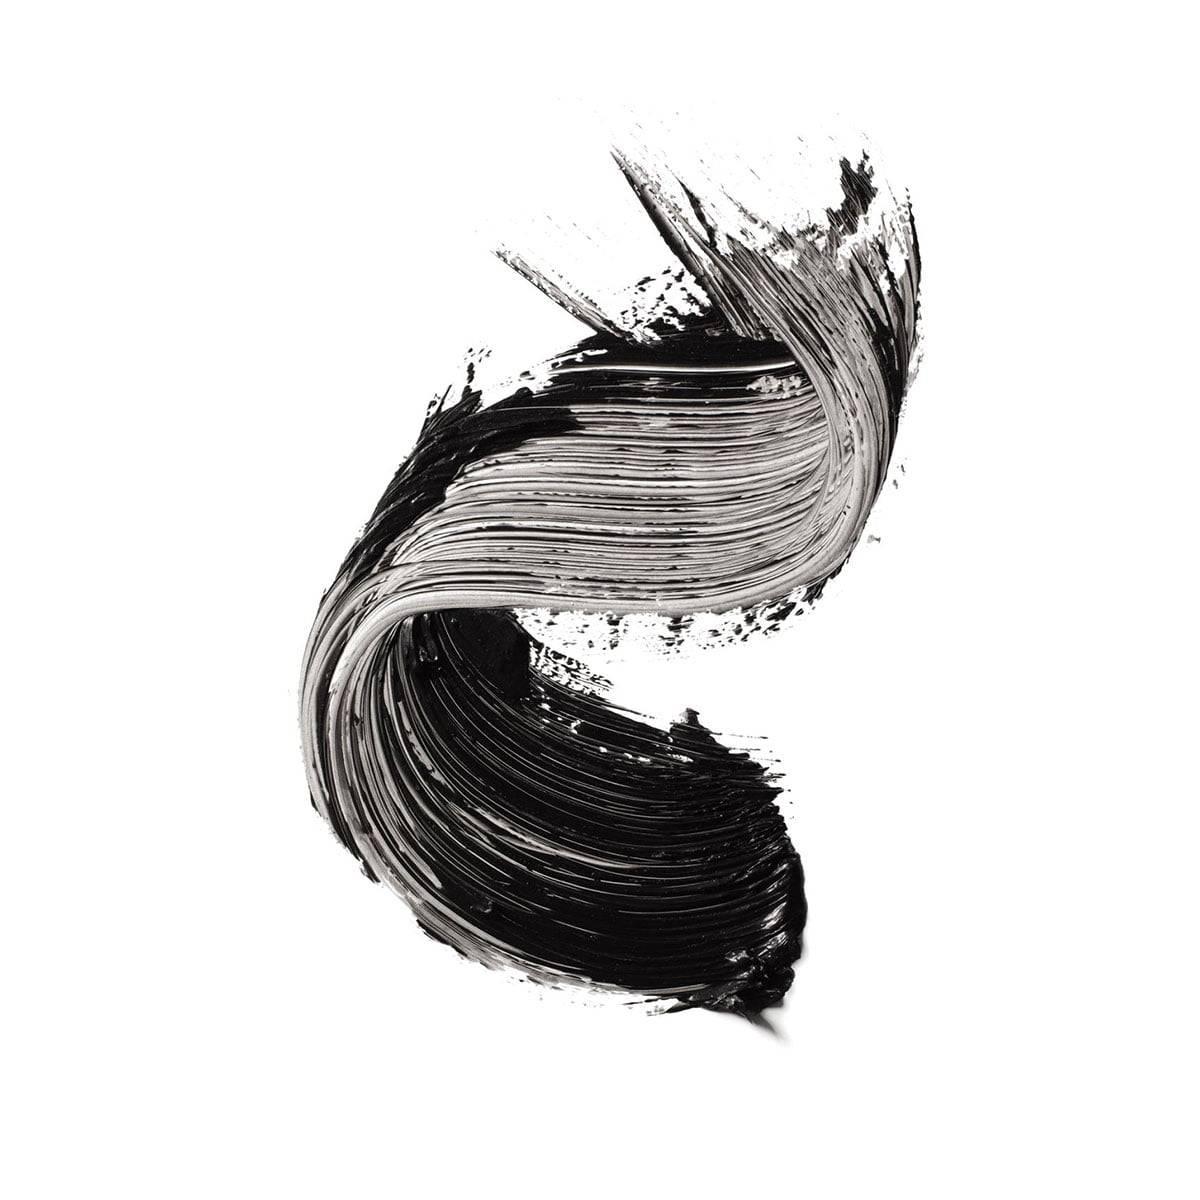 La Roche Posay Känslig Toleriane Make up WATERPROOF_MASCARA_Black 33